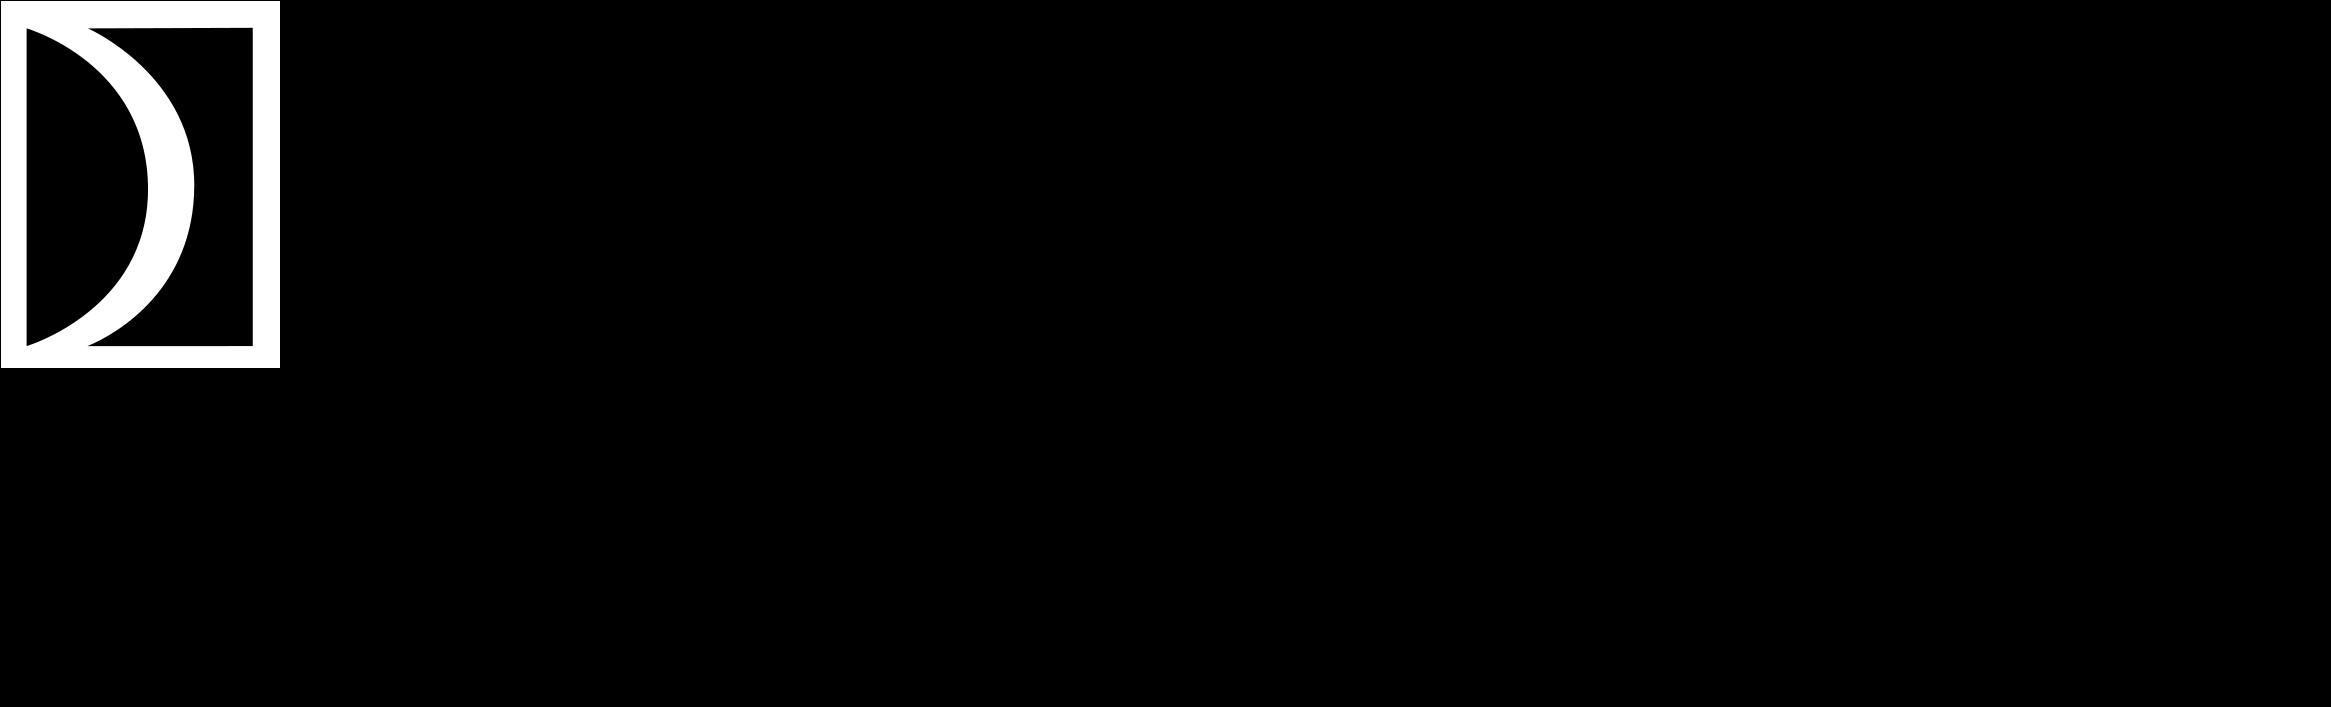 HD Carnival Logo Png Transparent.